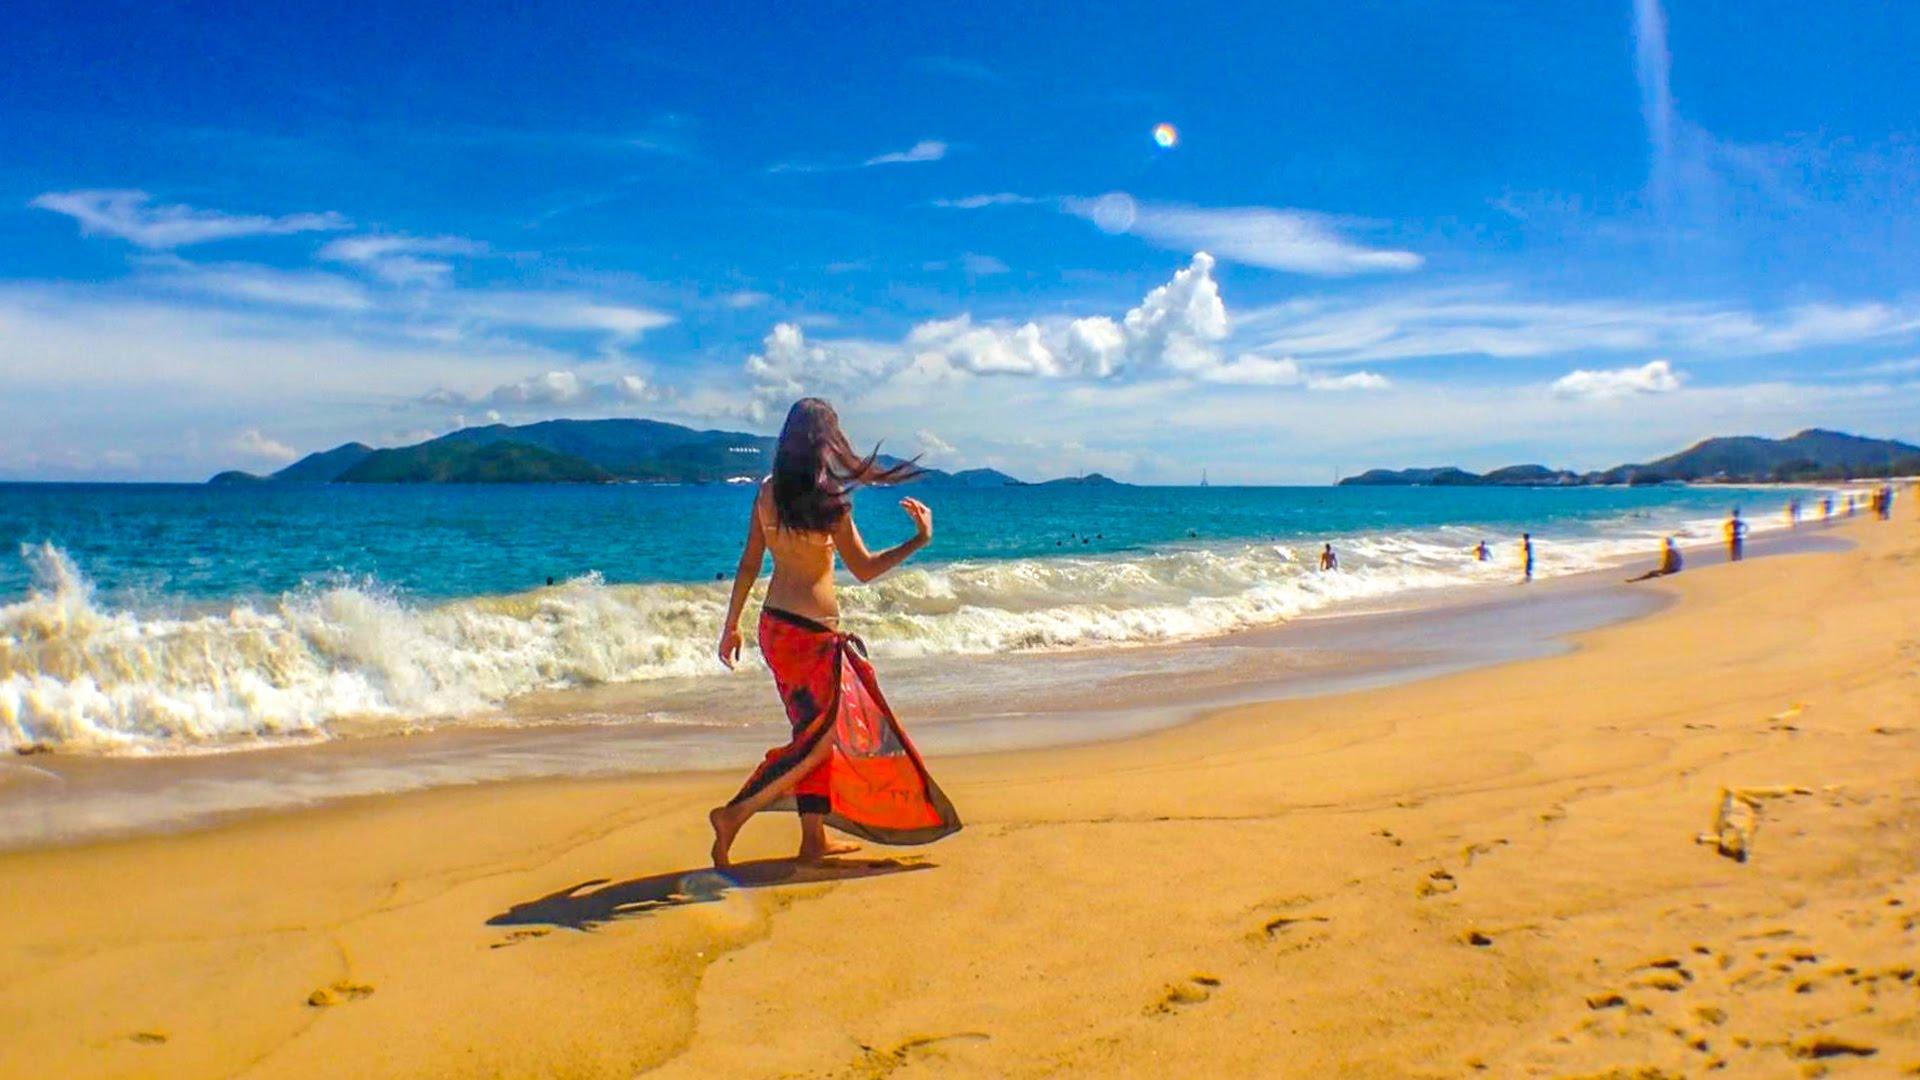 туры во вьетнам цена на туры во вьетнам с вылетом из минска